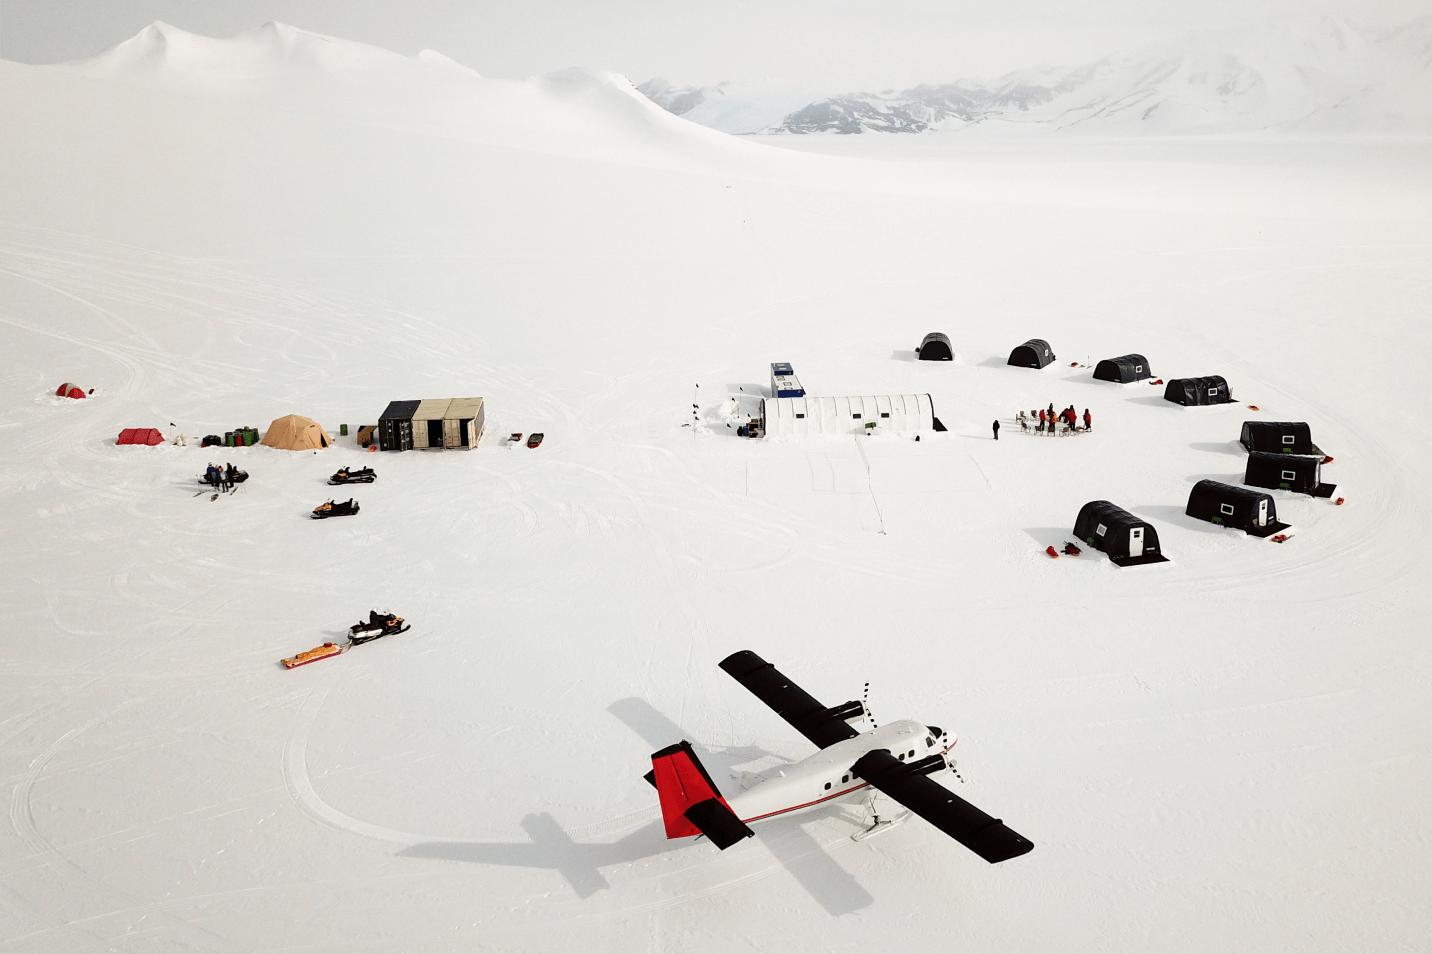 Antarctica Airbnb camp